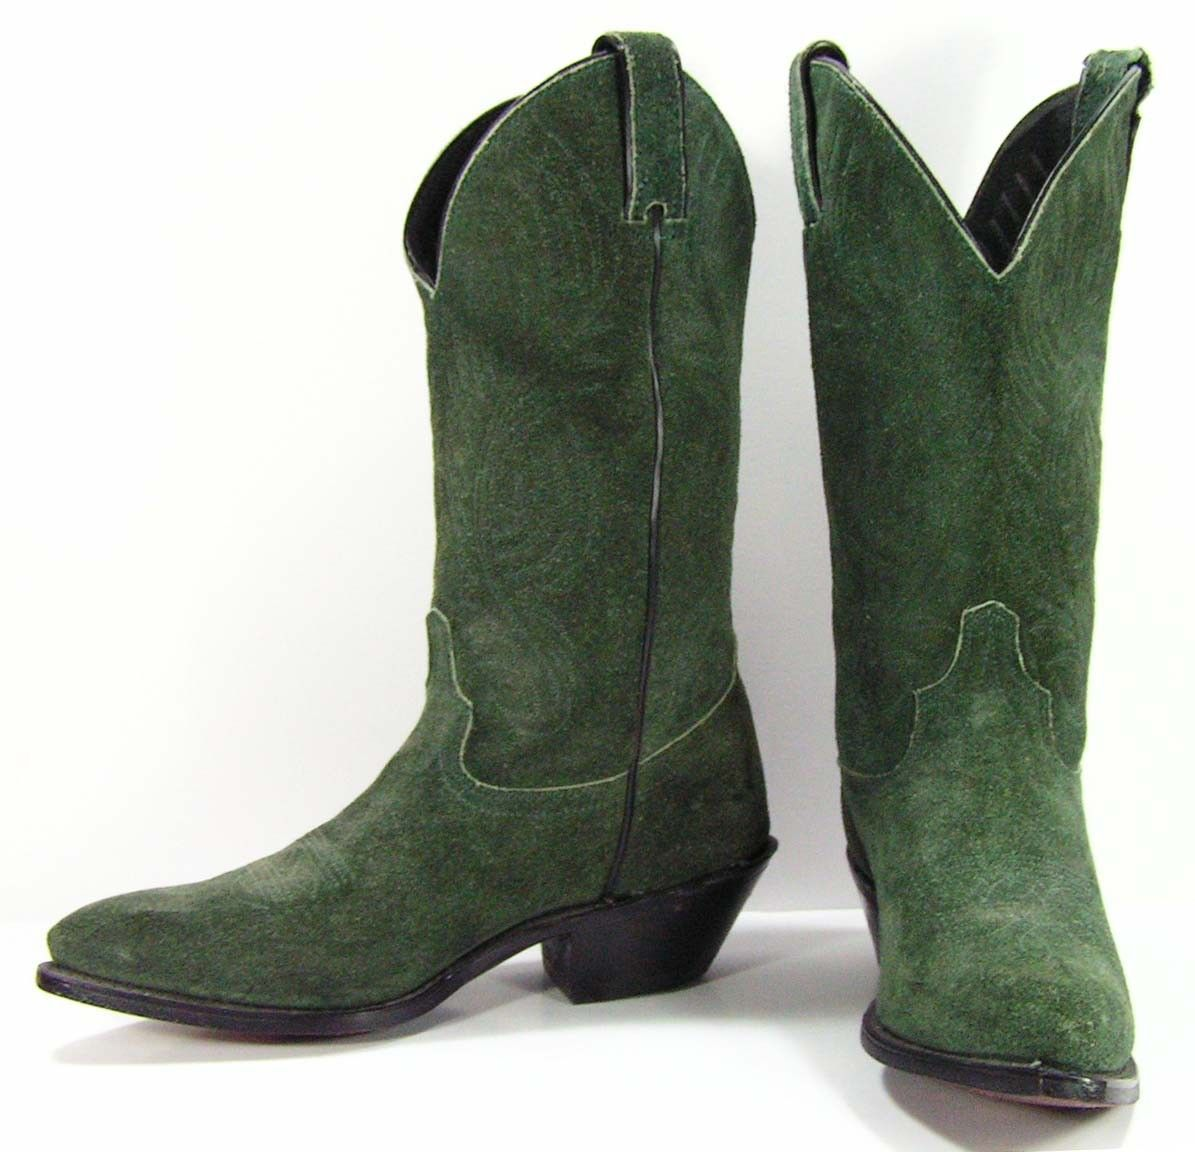 c569e7ca7ec cowboy boots womens 6.5 B M green leather suede western cowgirl ...